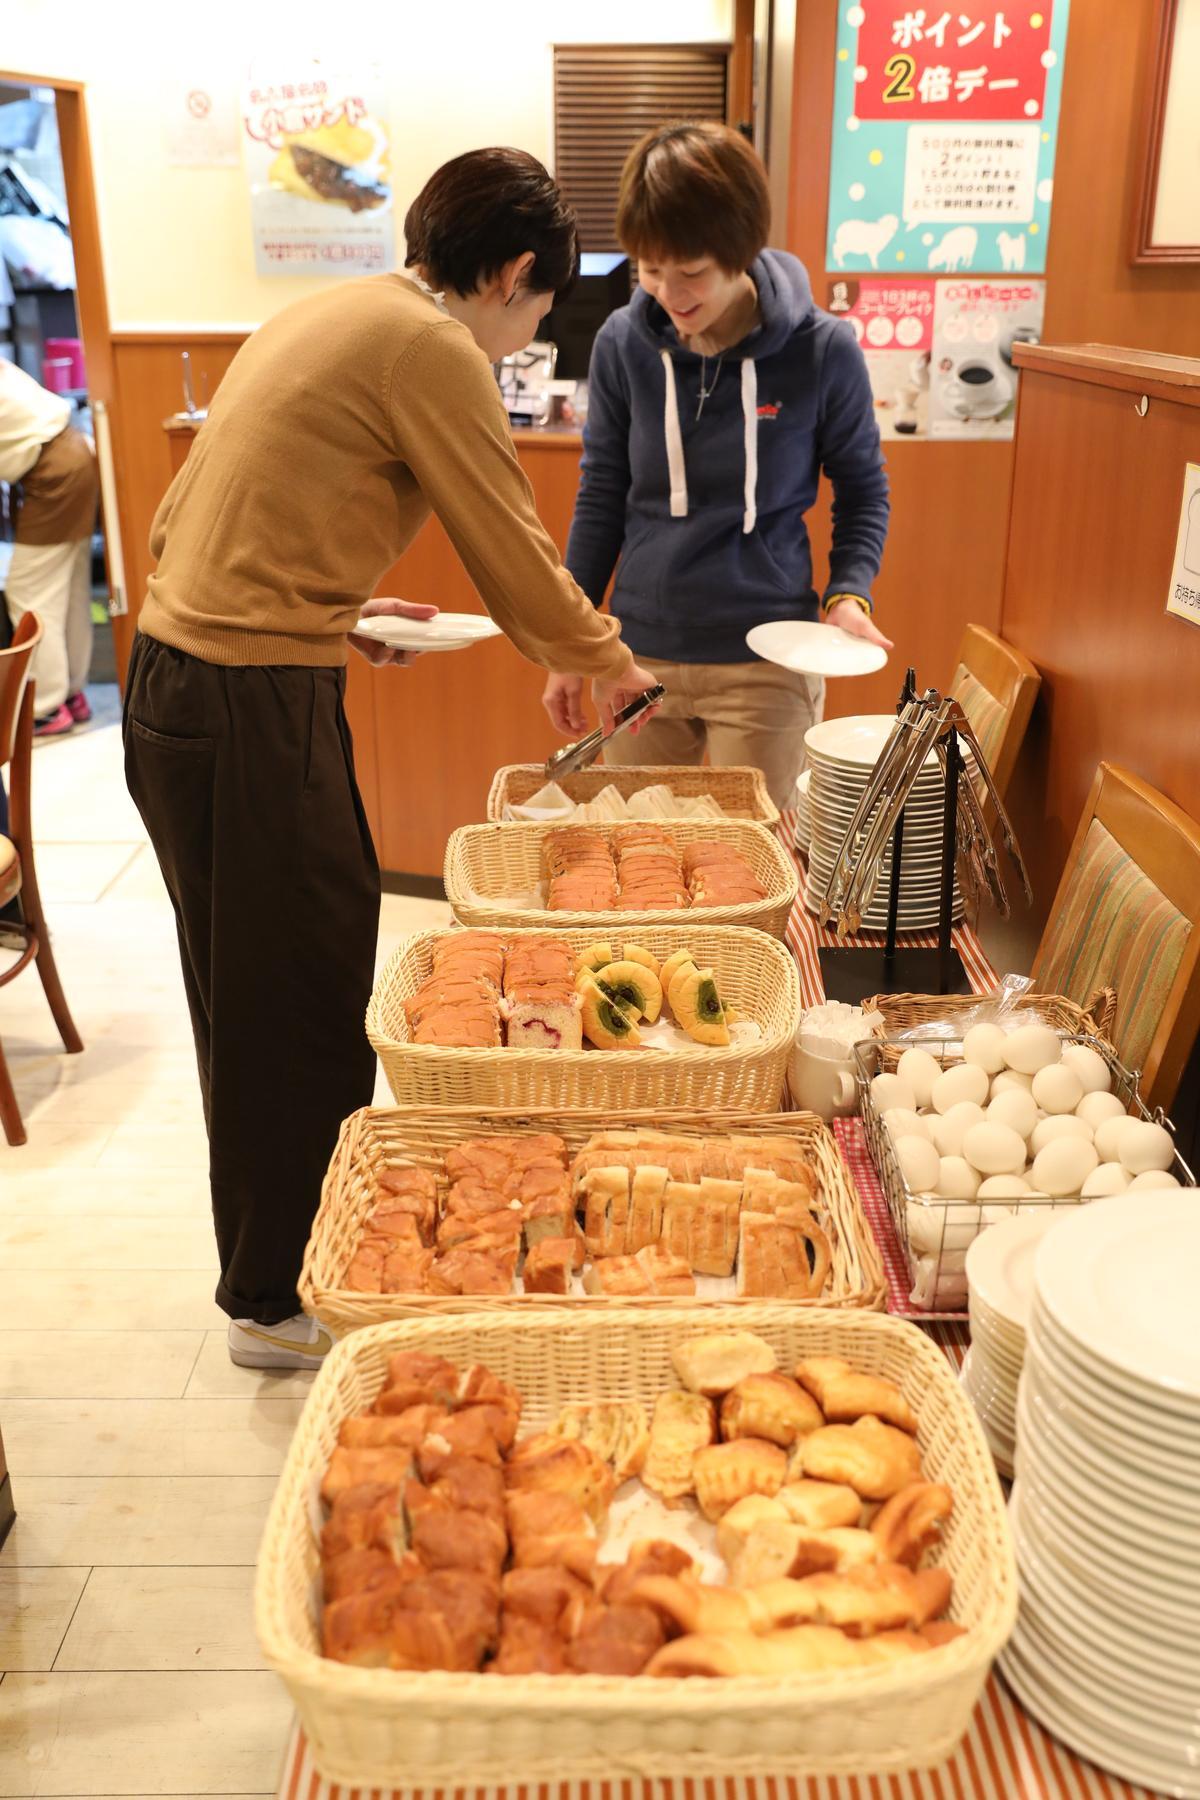 Chapeau Blanc相當有誠意,吃到飽的麵包選擇很豐富。